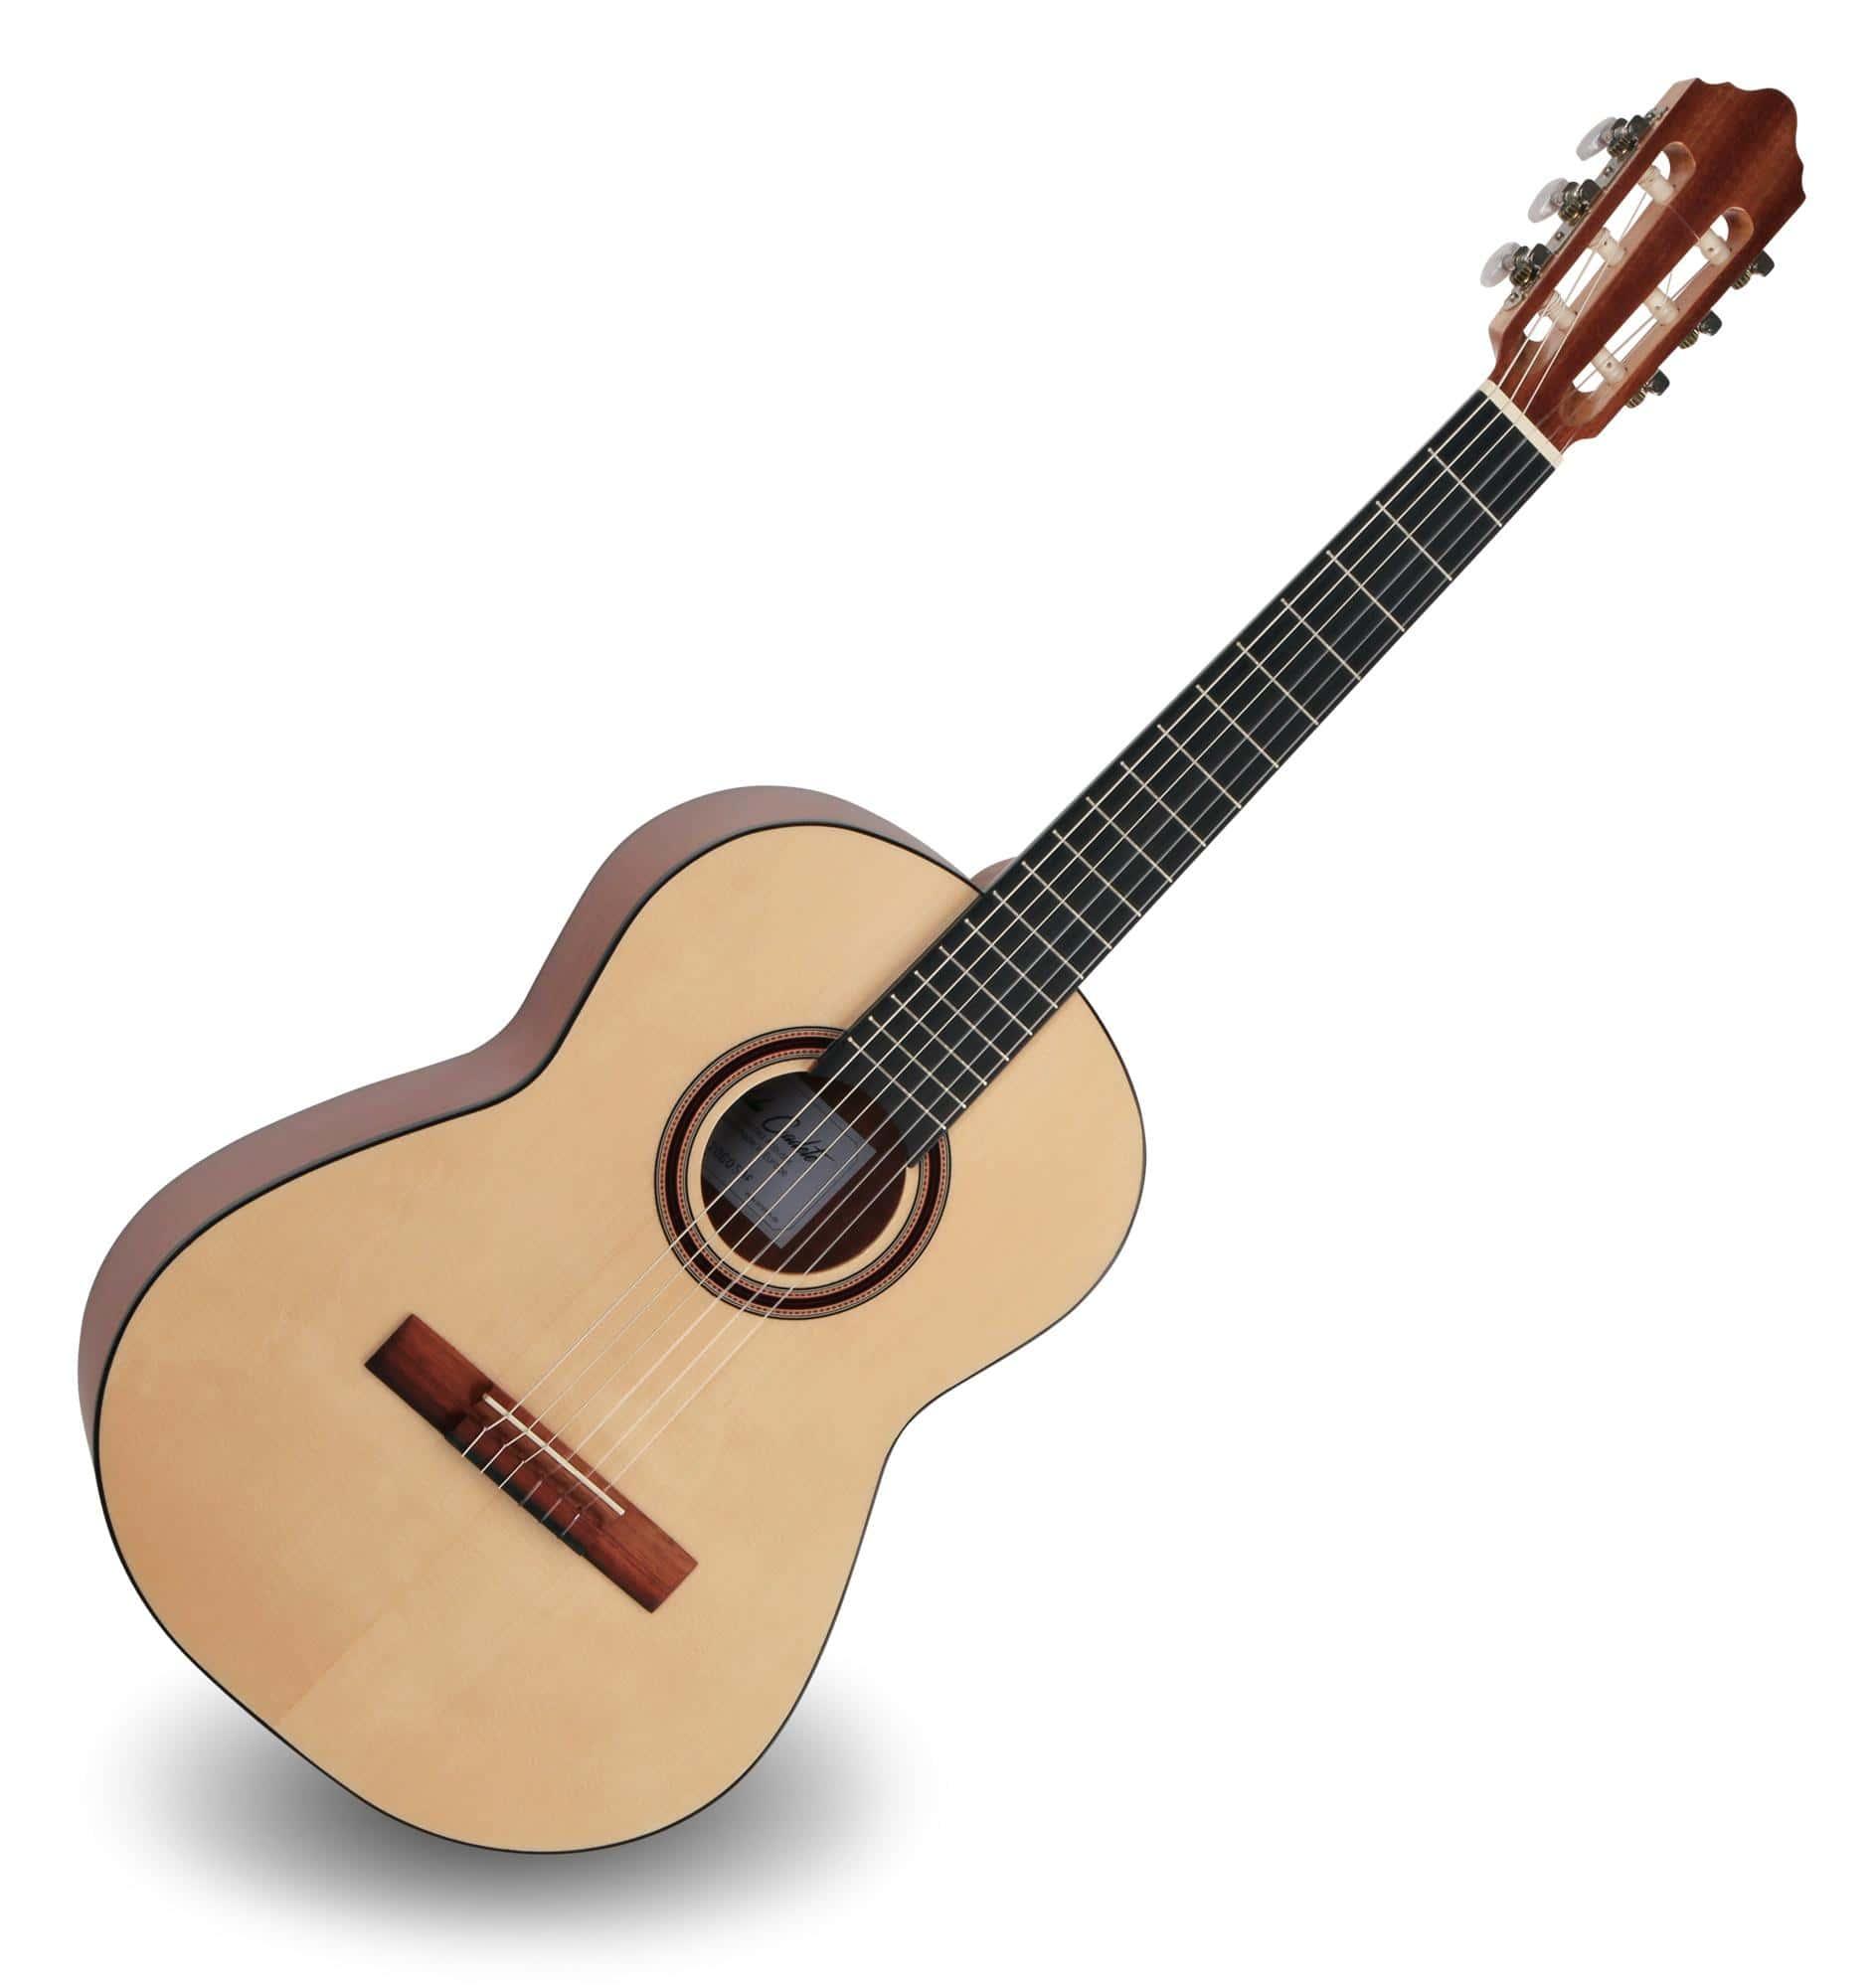 Calida Cadete Konzertgitarre 3 4 Fichte Hochglanz Made in Portugal